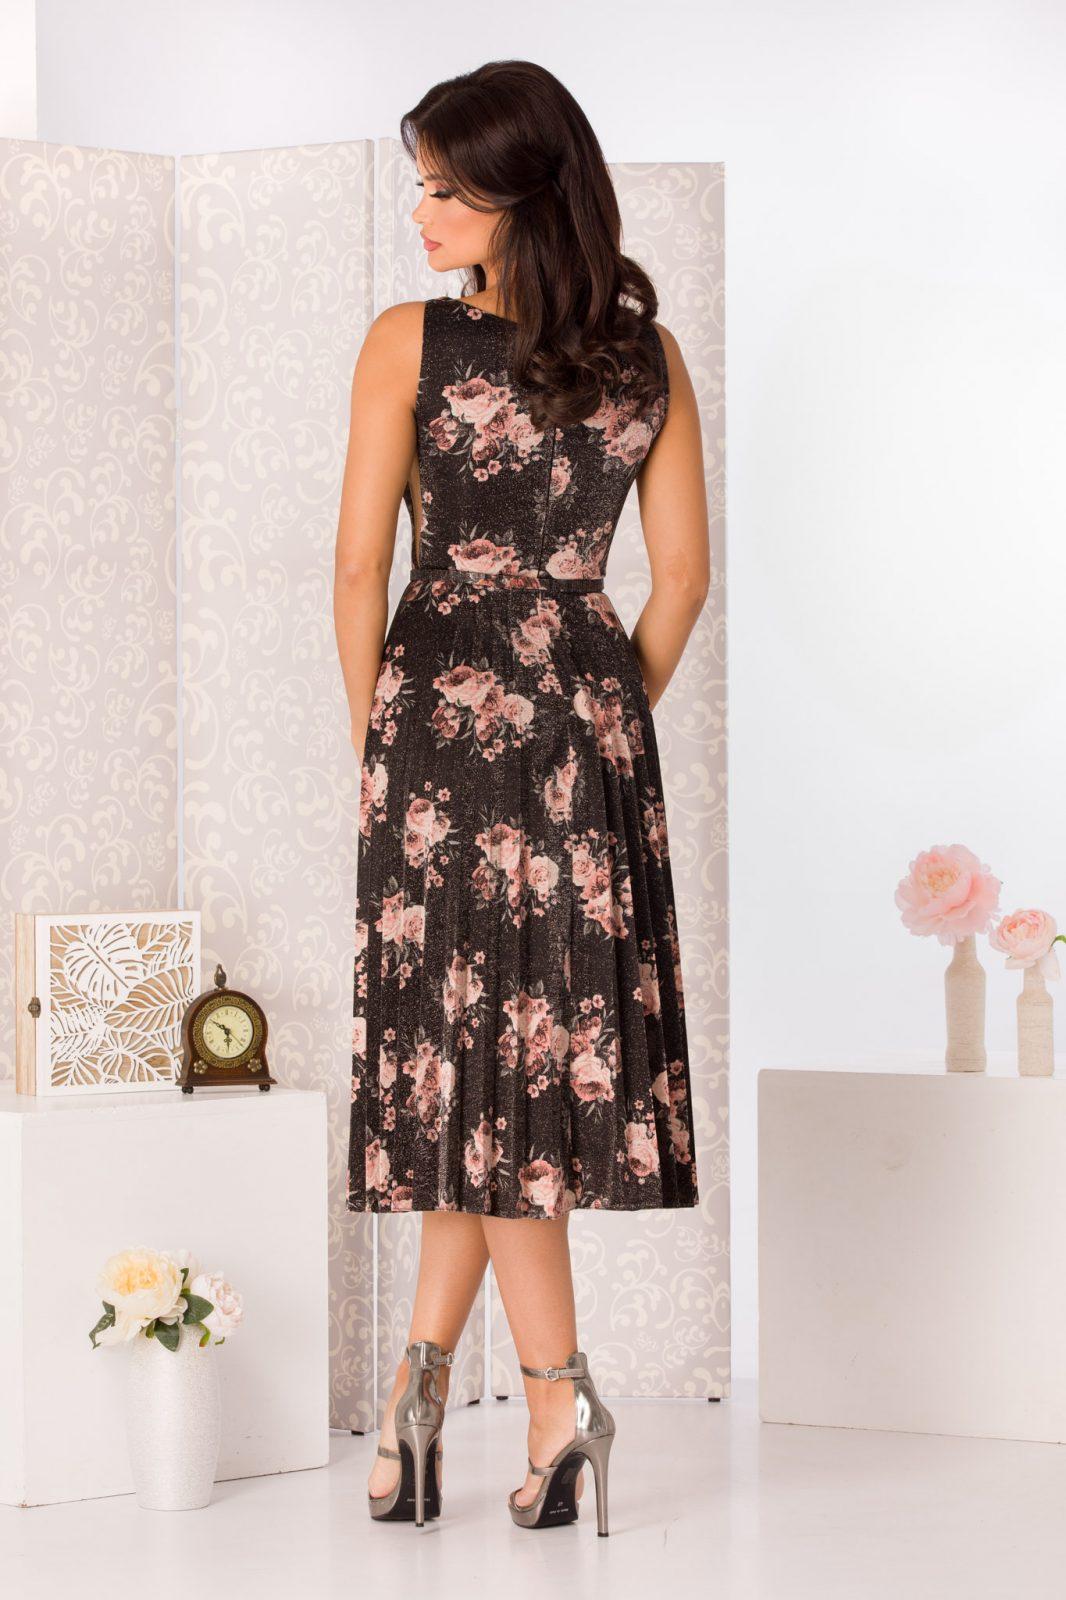 Larra Floral Φόρεμα 4984